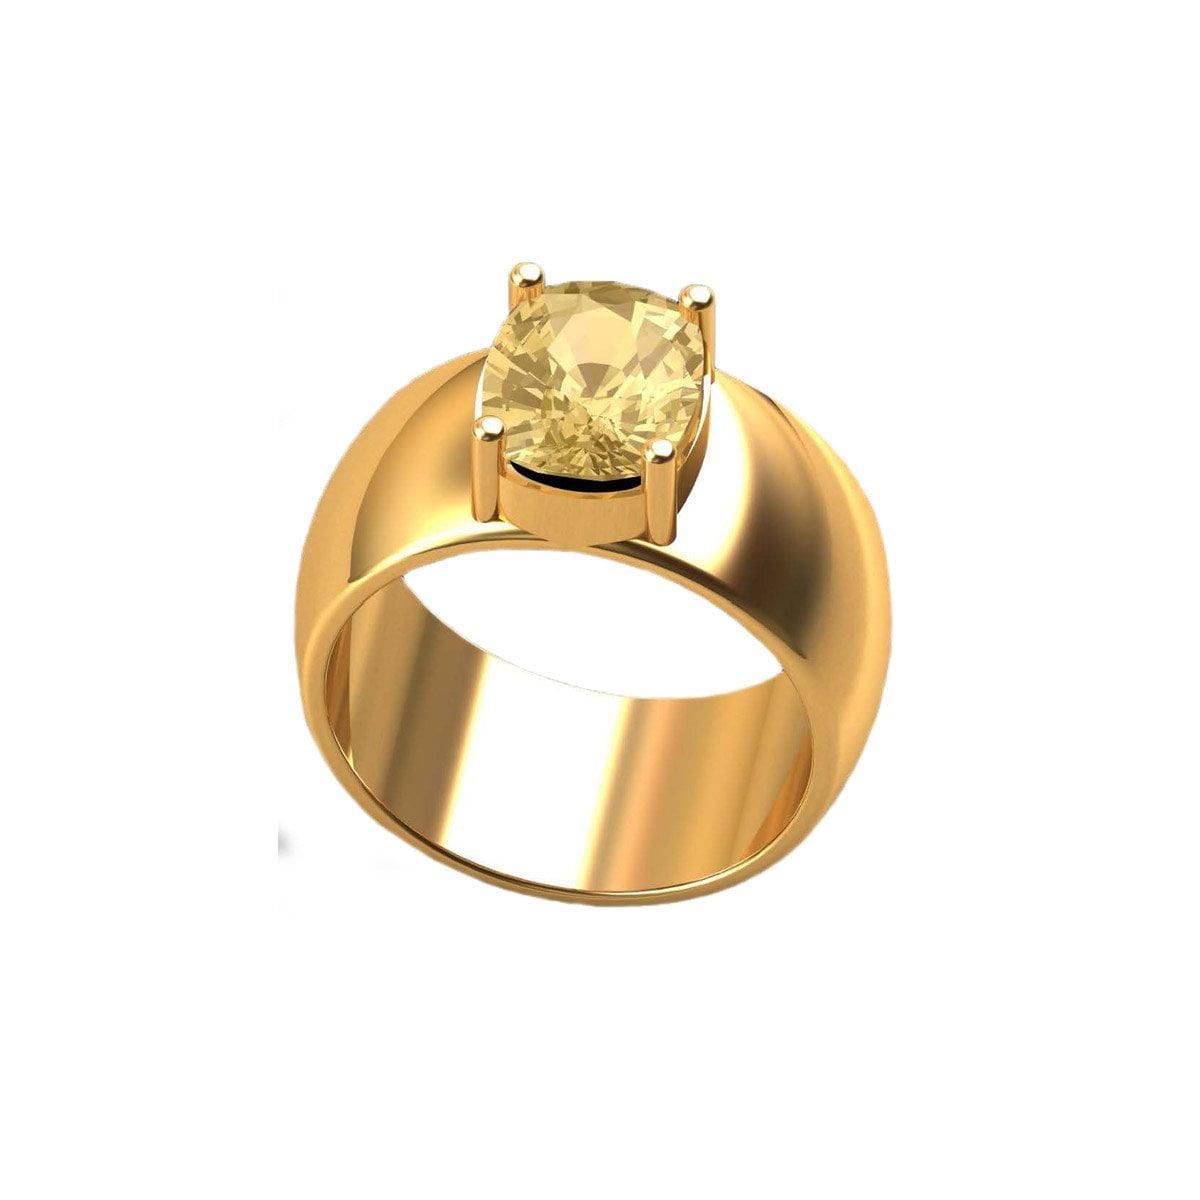 Pokhraj Gold Ring